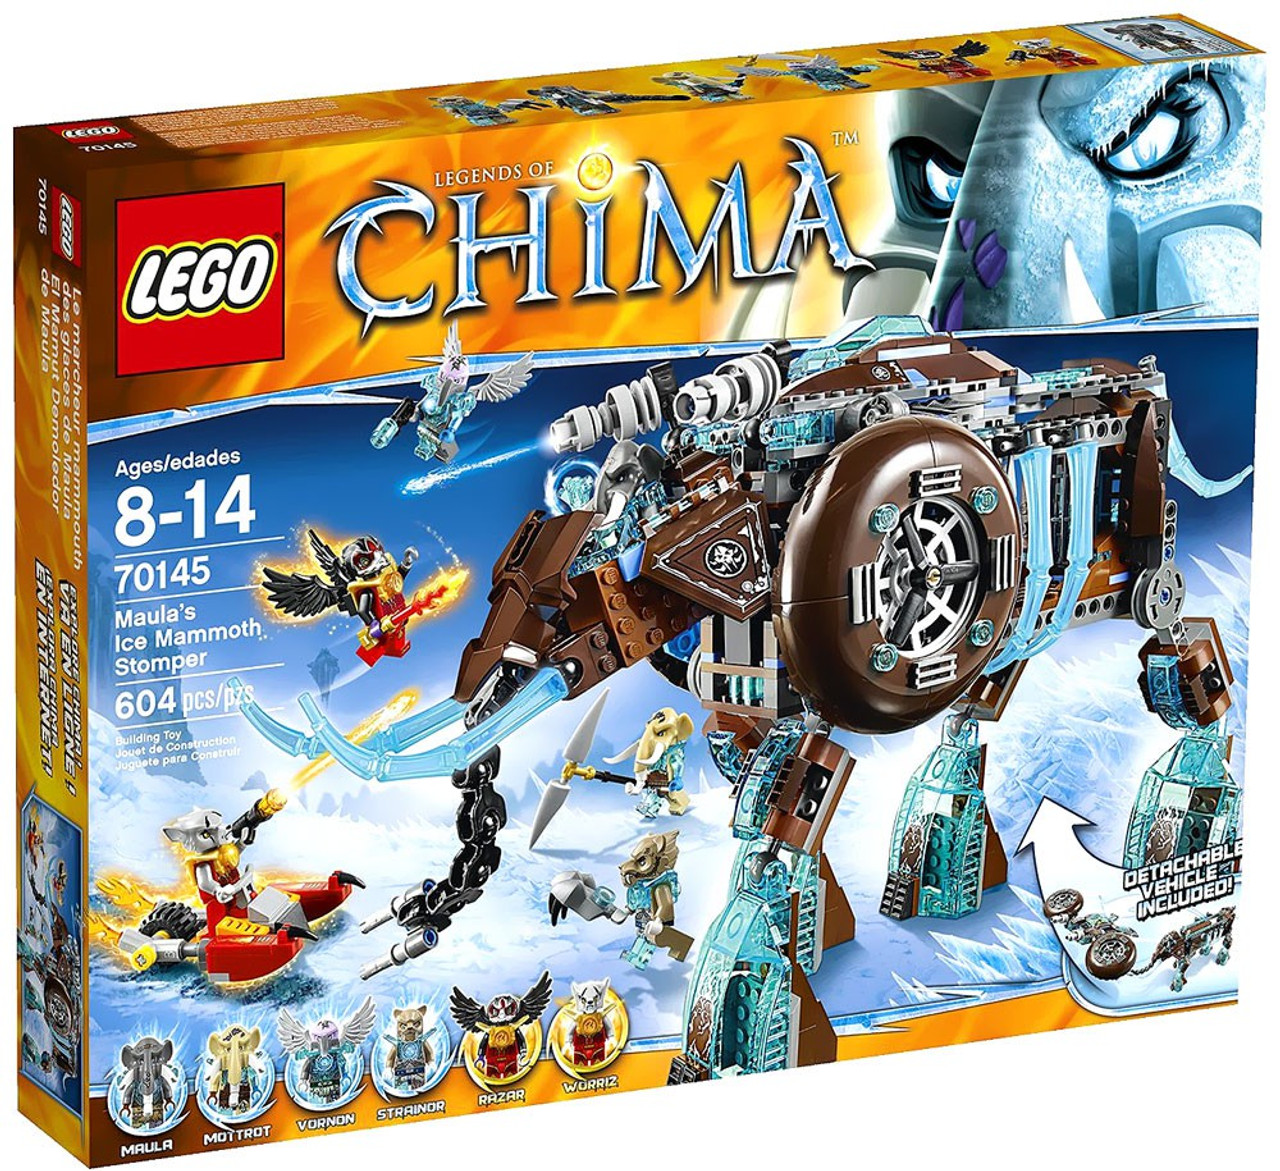 LEGO Legends of Chima Maula's Ice Mammoth Stomper Set #70145